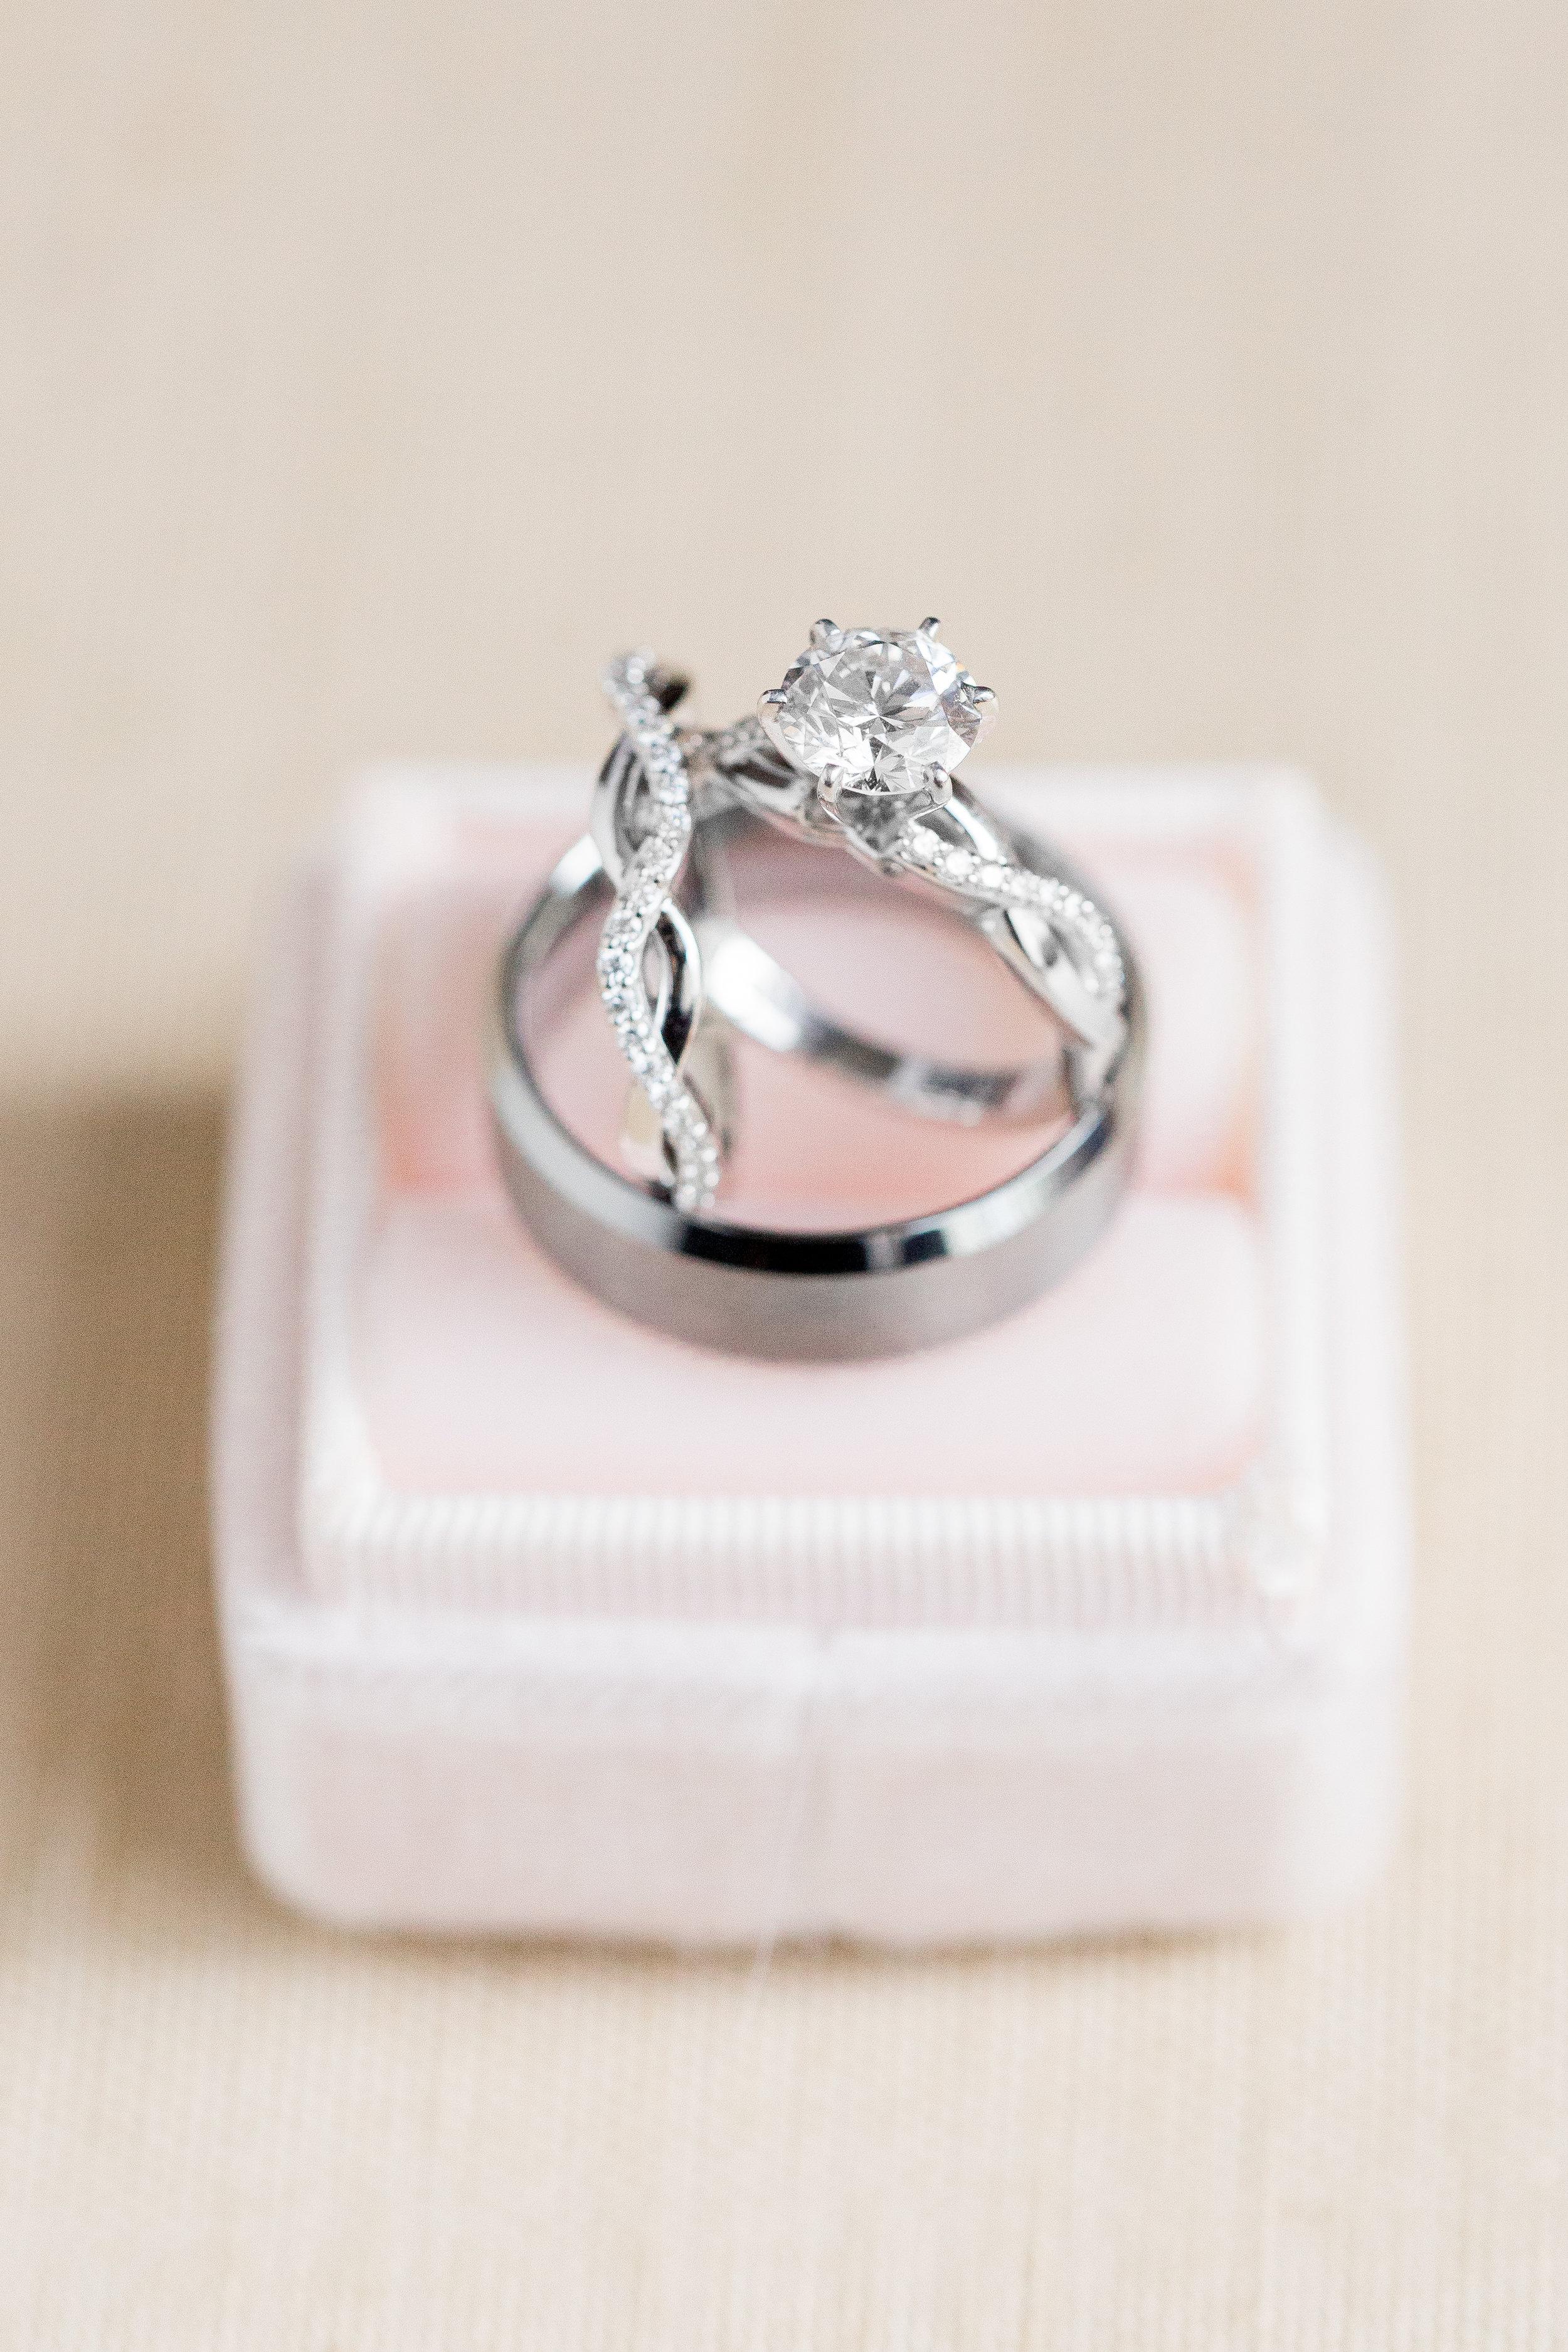 15wedding-rings-captured-by-destination-wedding-photographer (10 of).jpg